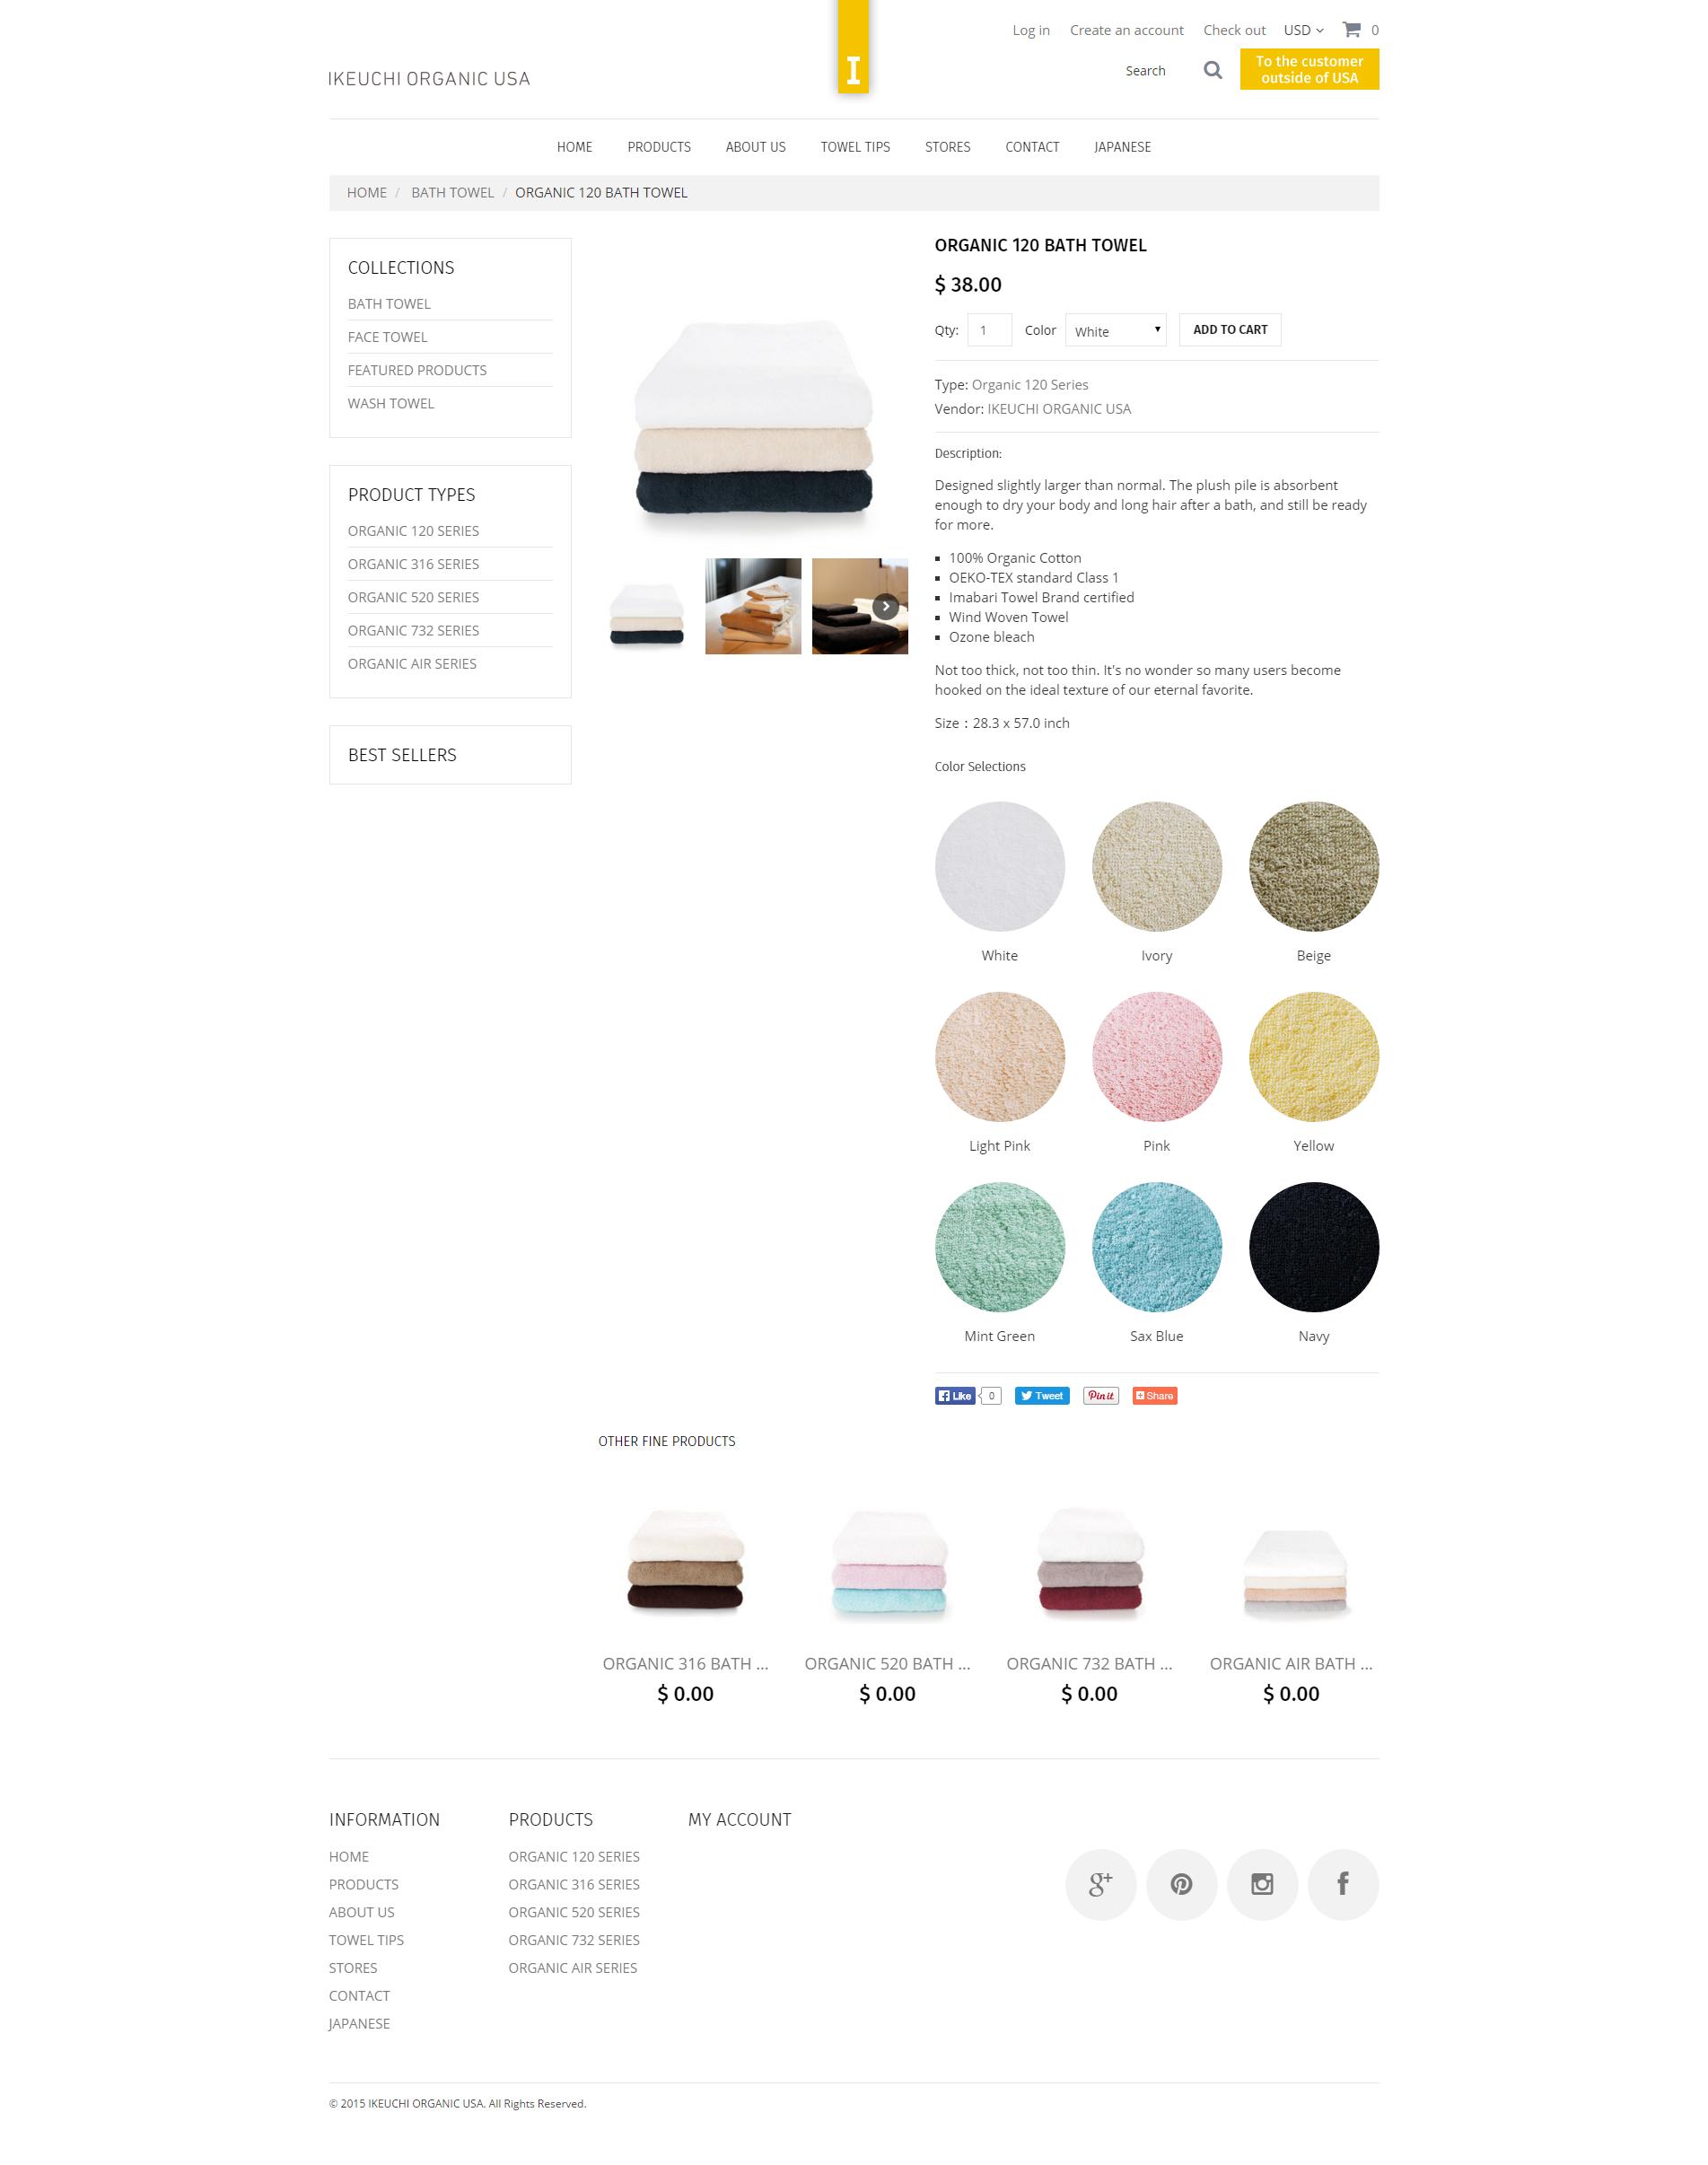 Ikeuchi Organic USA website product detail page #webdesign #webdesignger #graphicdesign #ui #userinterface #bootstrap #responsive #ecsite #organictowel